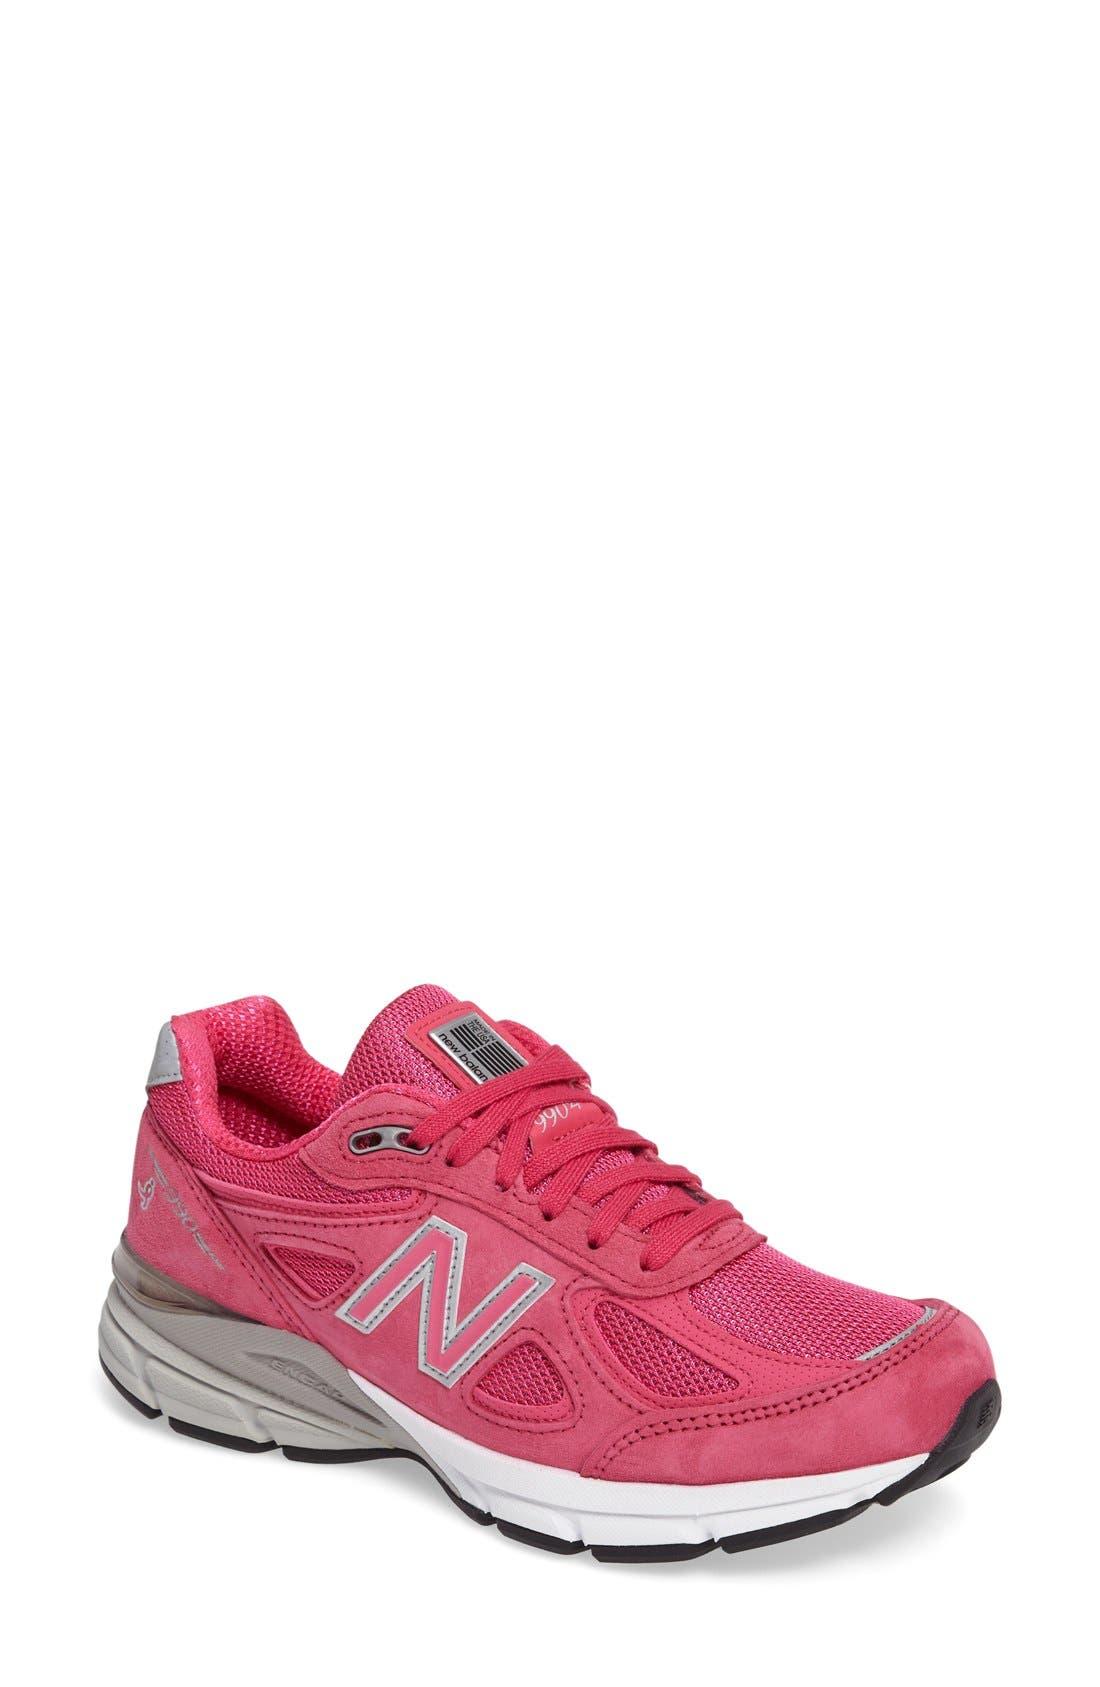 Alternate Image 1 Selected - New Balance '990 Premium' Running Shoe (Women)